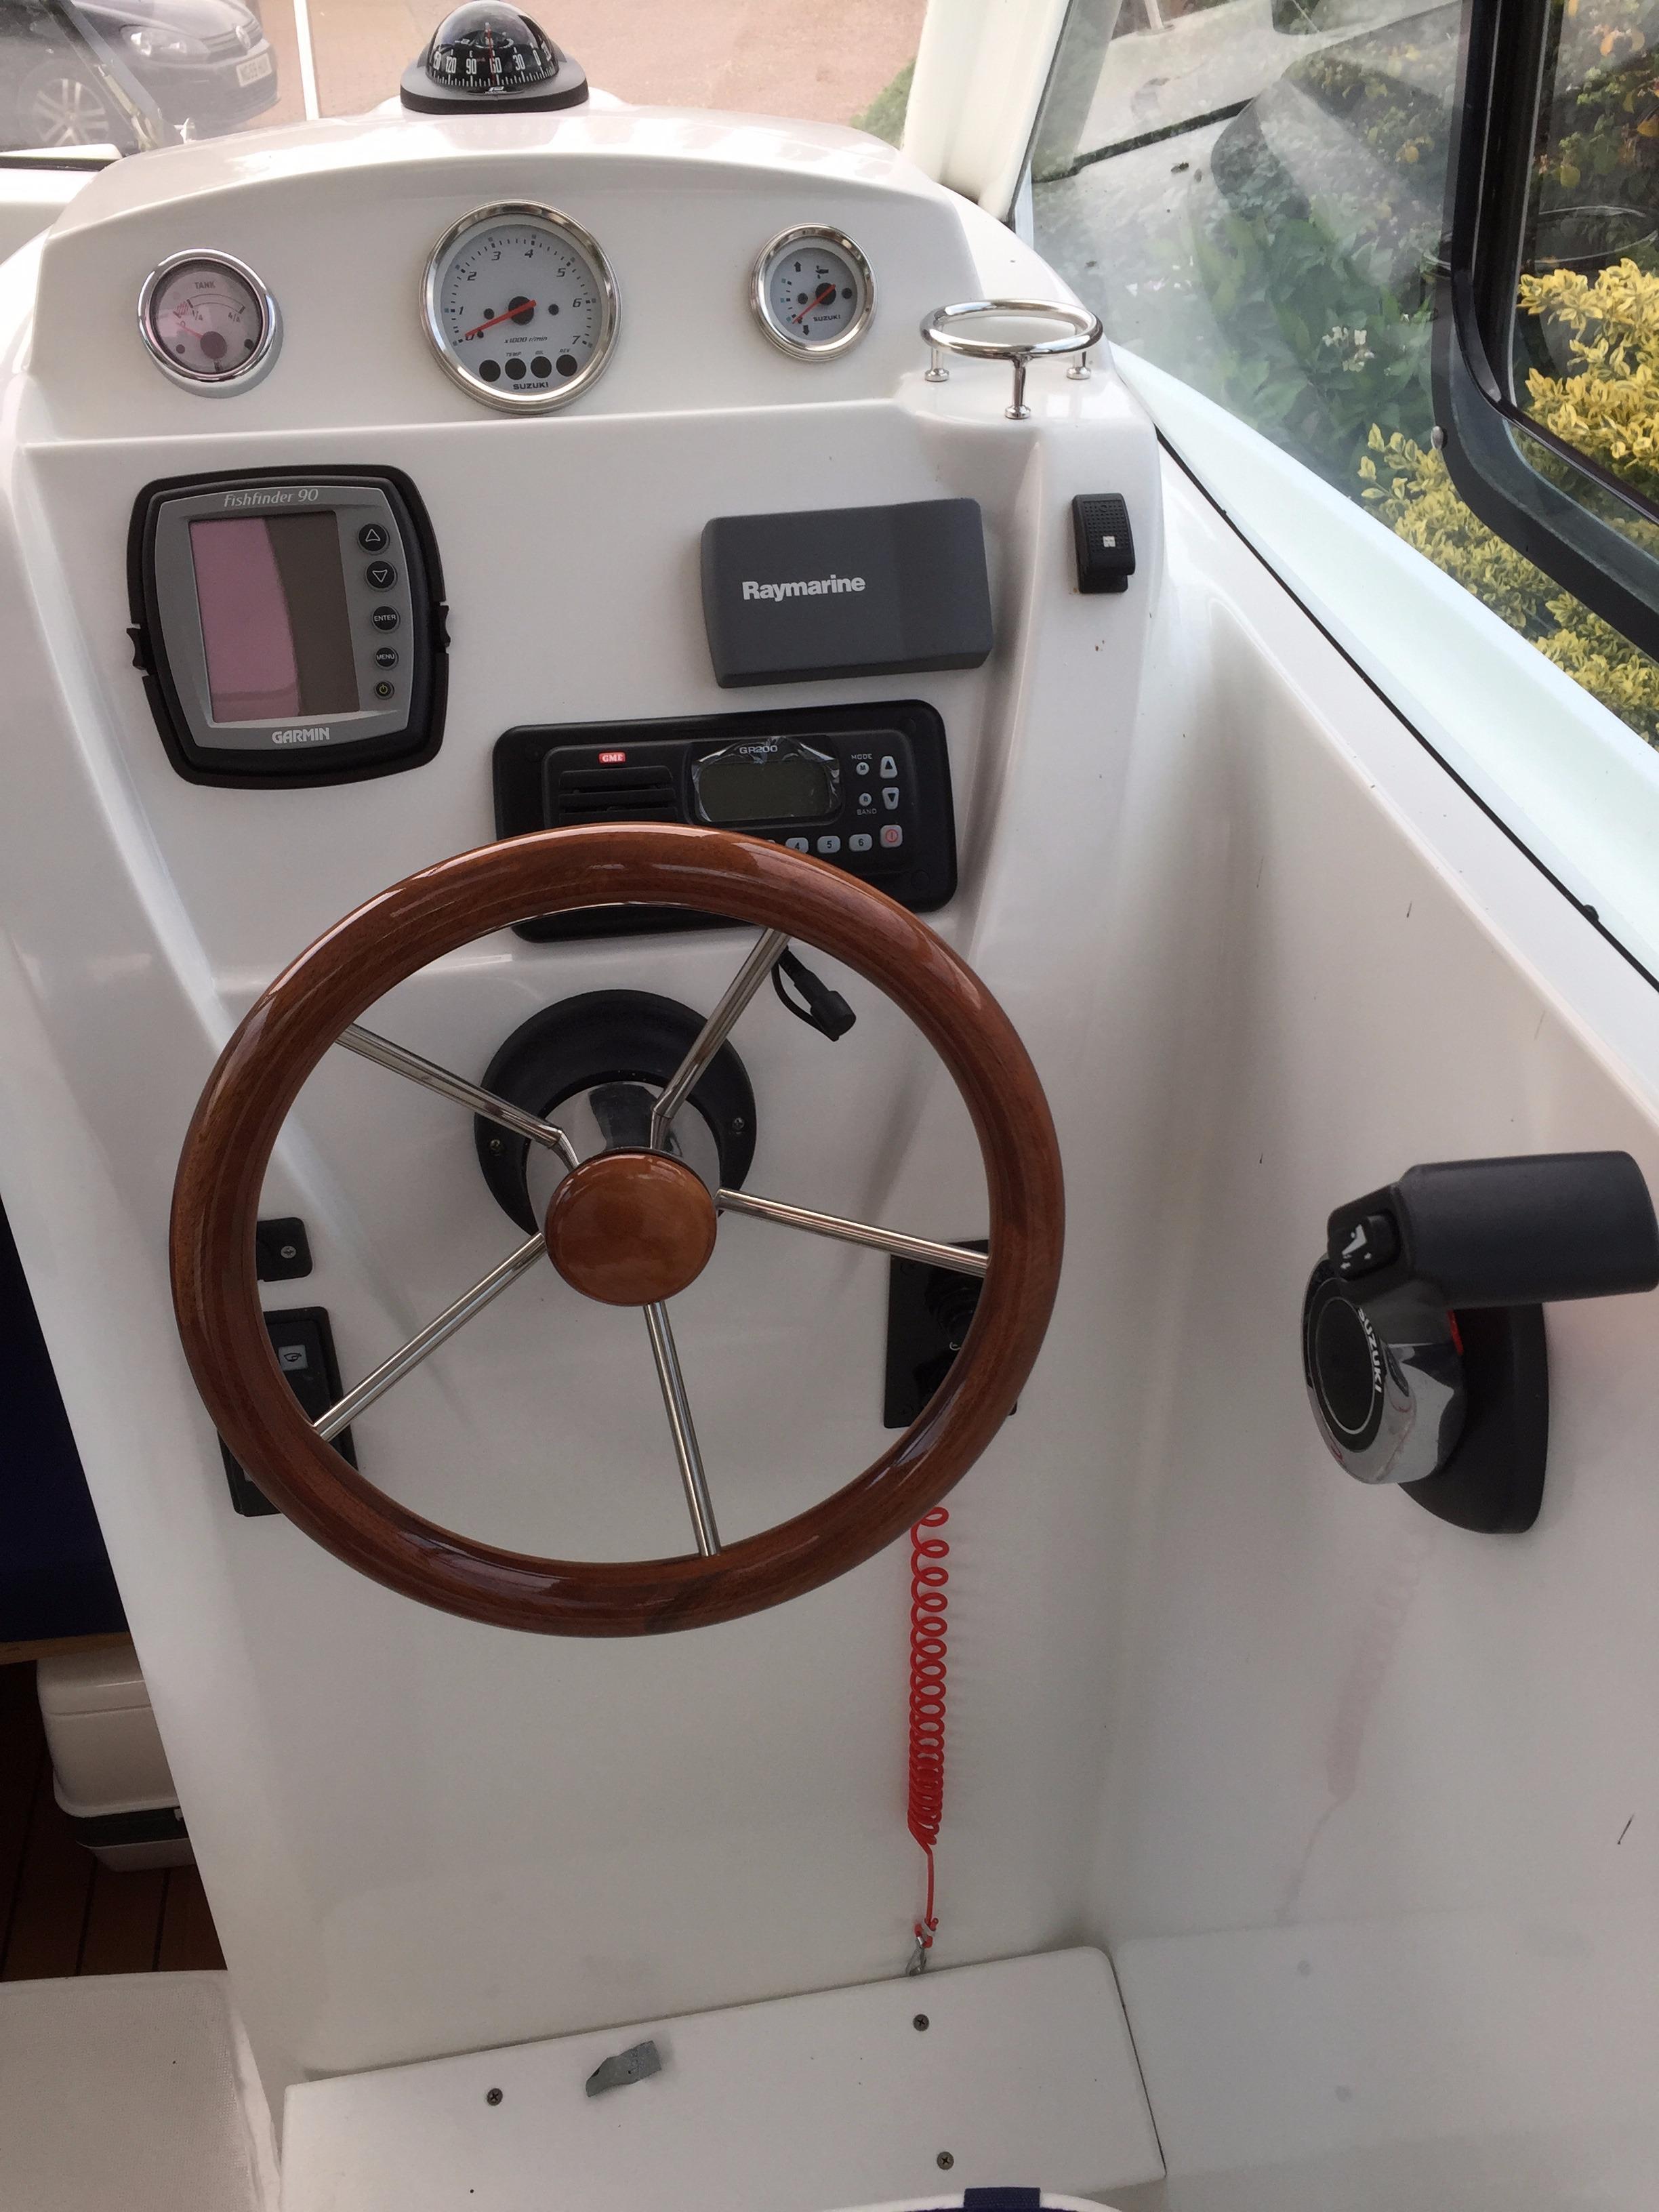 Beneteau Antares 580 For Sale Maiden Marine : 5981855201610250530148511XLARGE from www.maiden-marine.co.uk size 2448 x 3264 jpeg 551kB